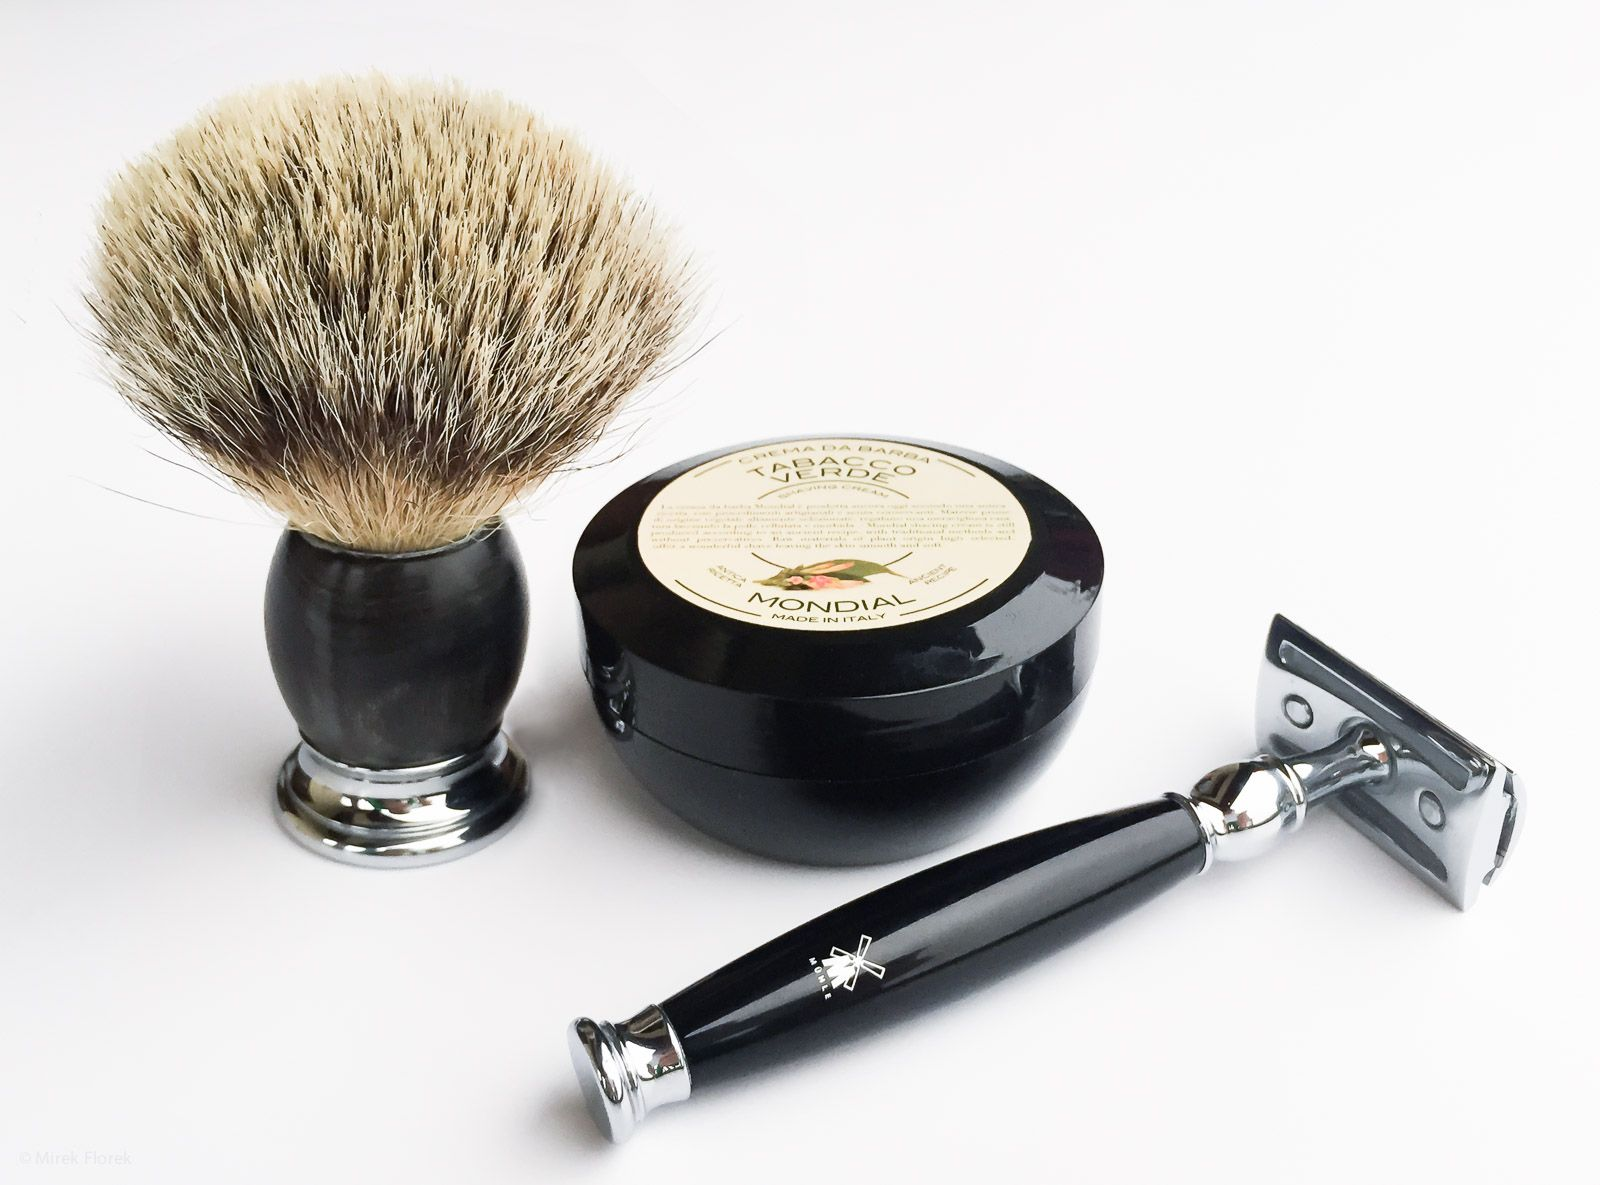 Golenie z kremem do golenia Mondial Crema da Barba Tabacco Verde (Shaving Cream)